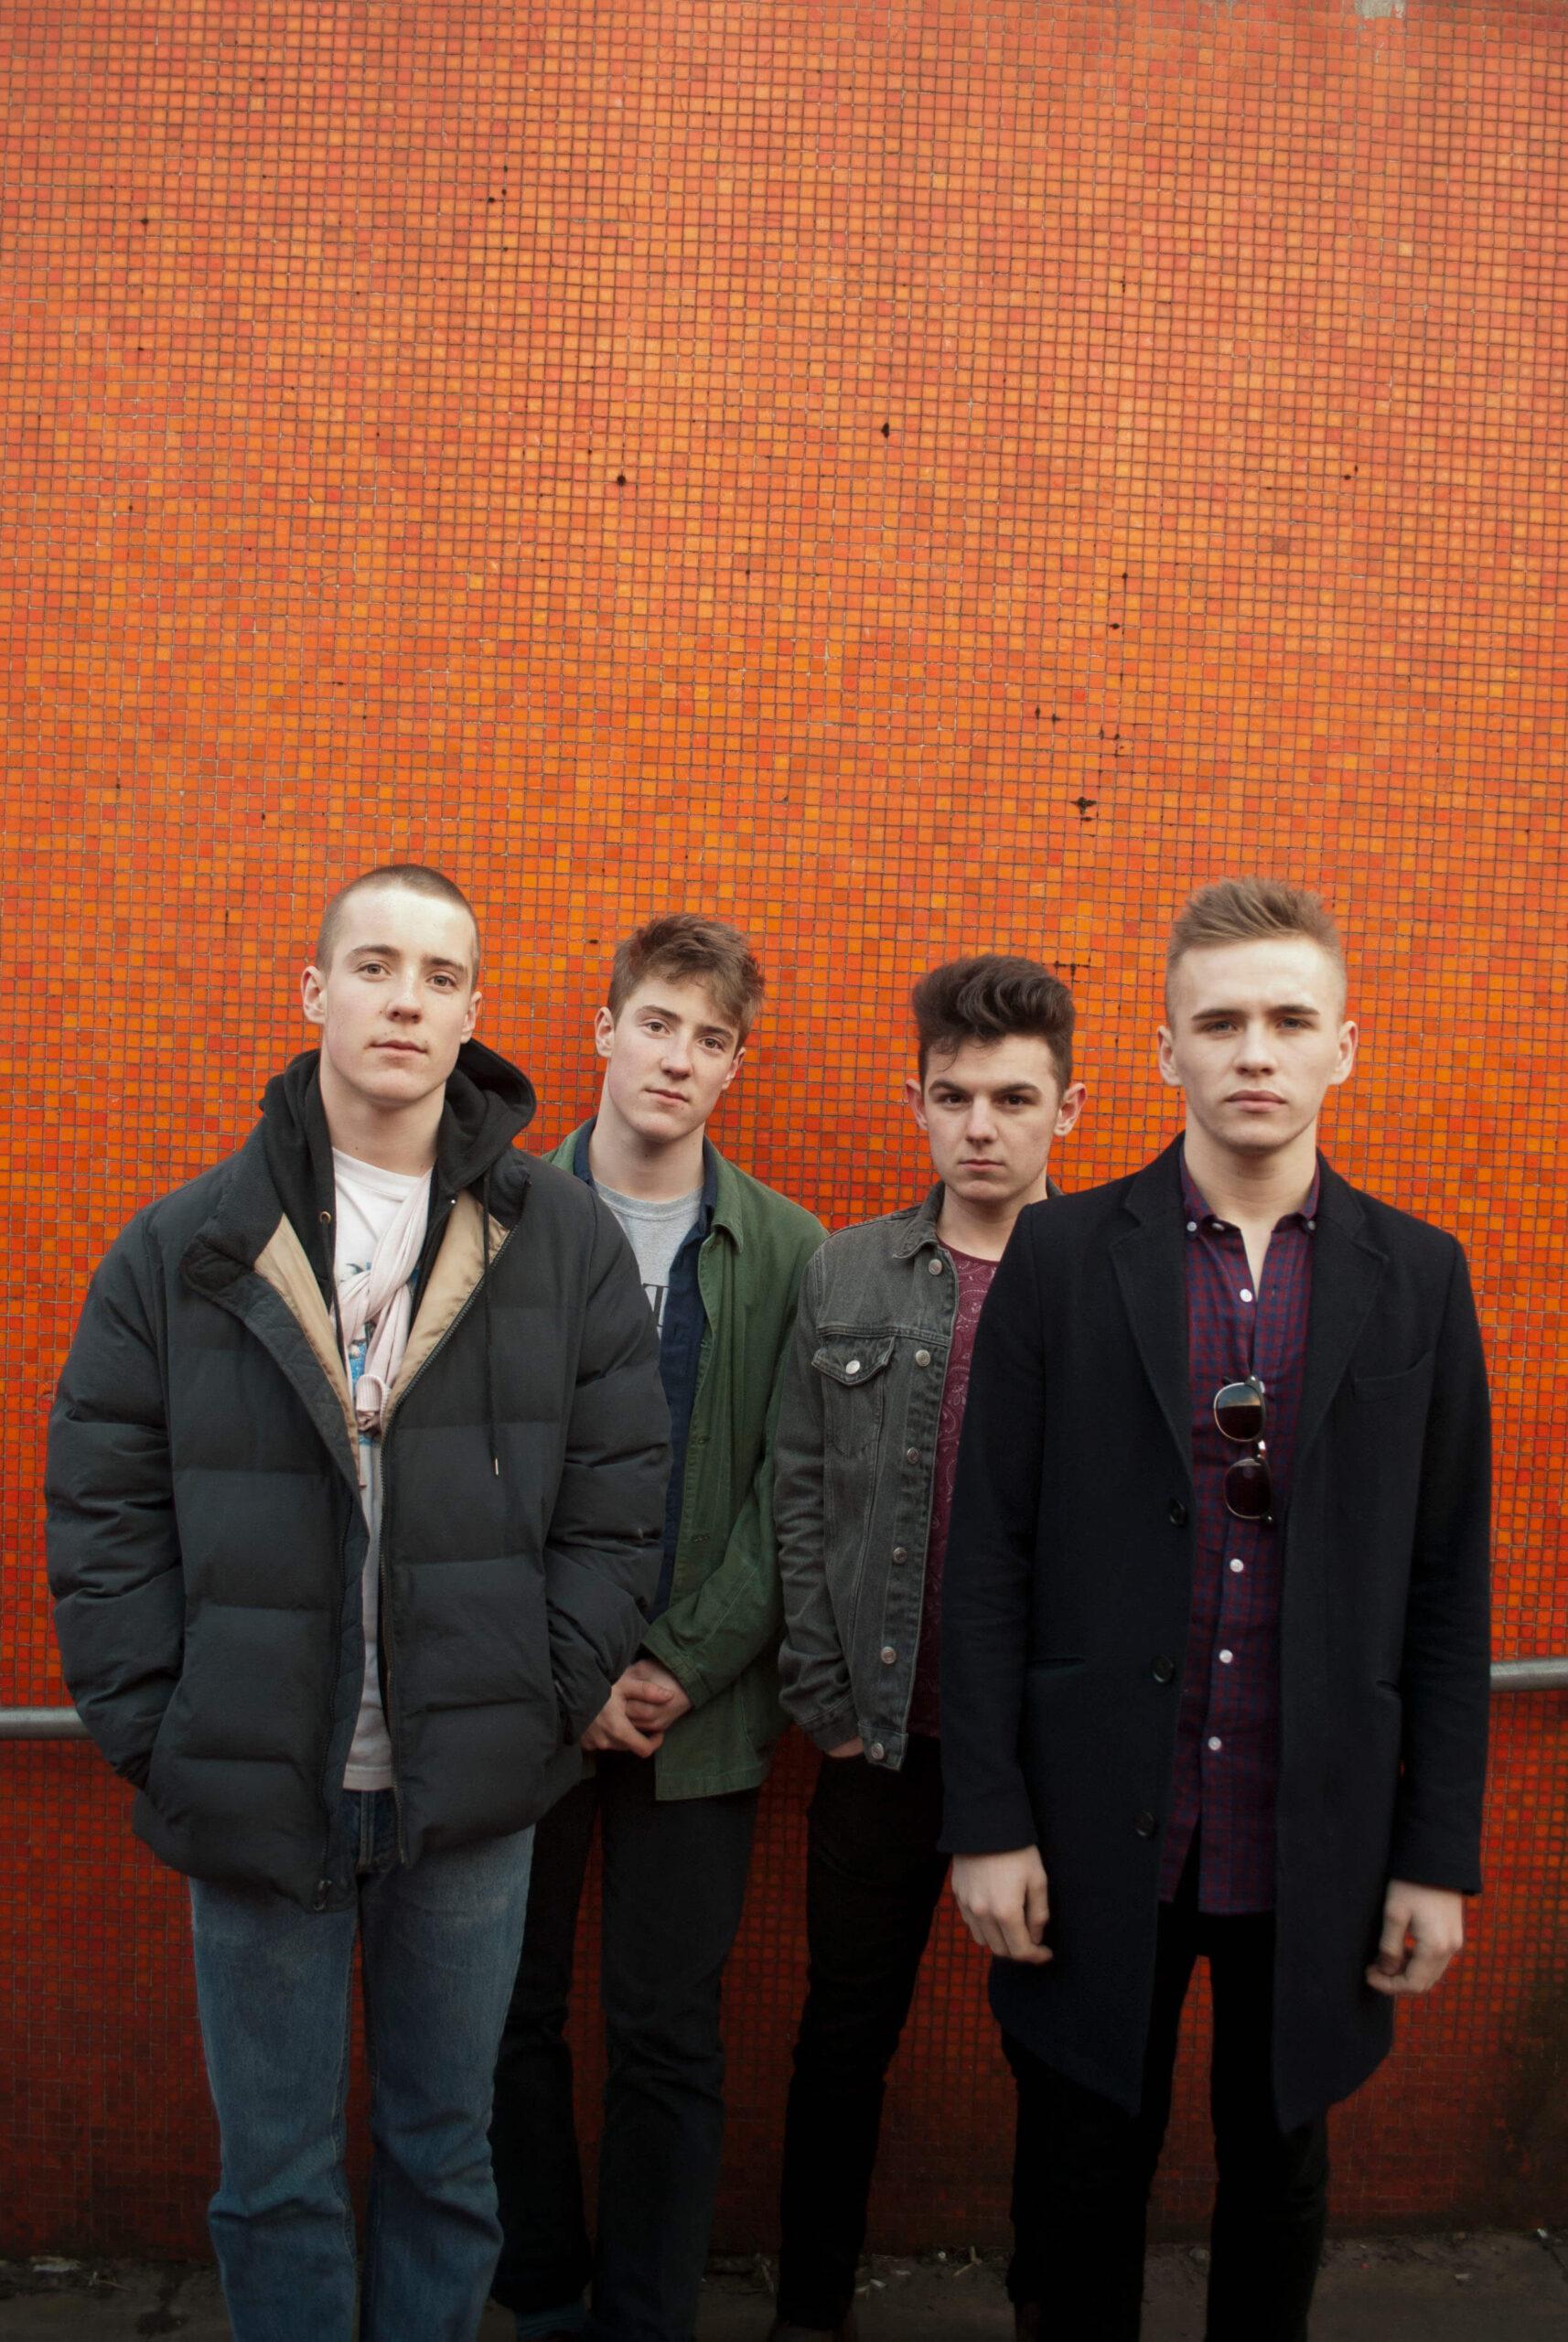 The Commonjets band photo - Underground England blog